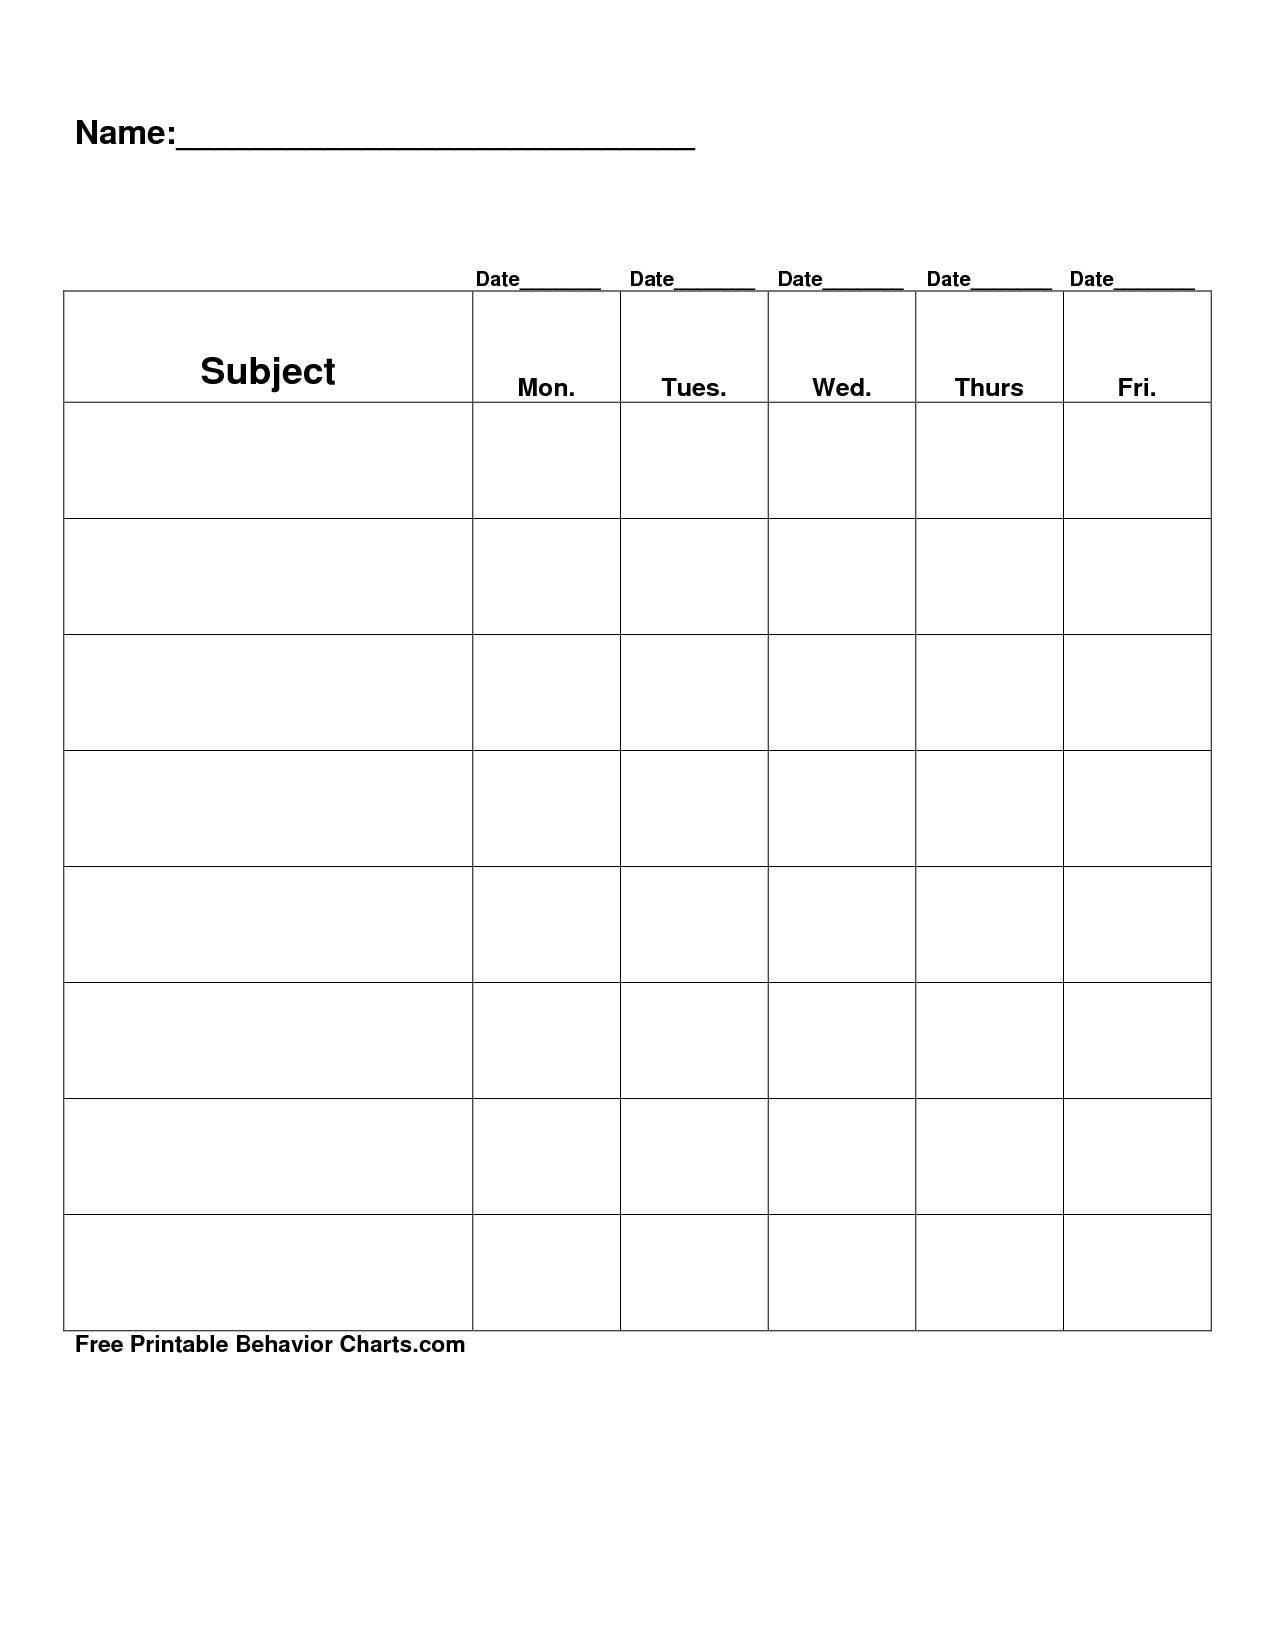 Free Printable Blank Charts | Free Printable Behavior Charts Com - Free Printable Incentive Charts For Teachers